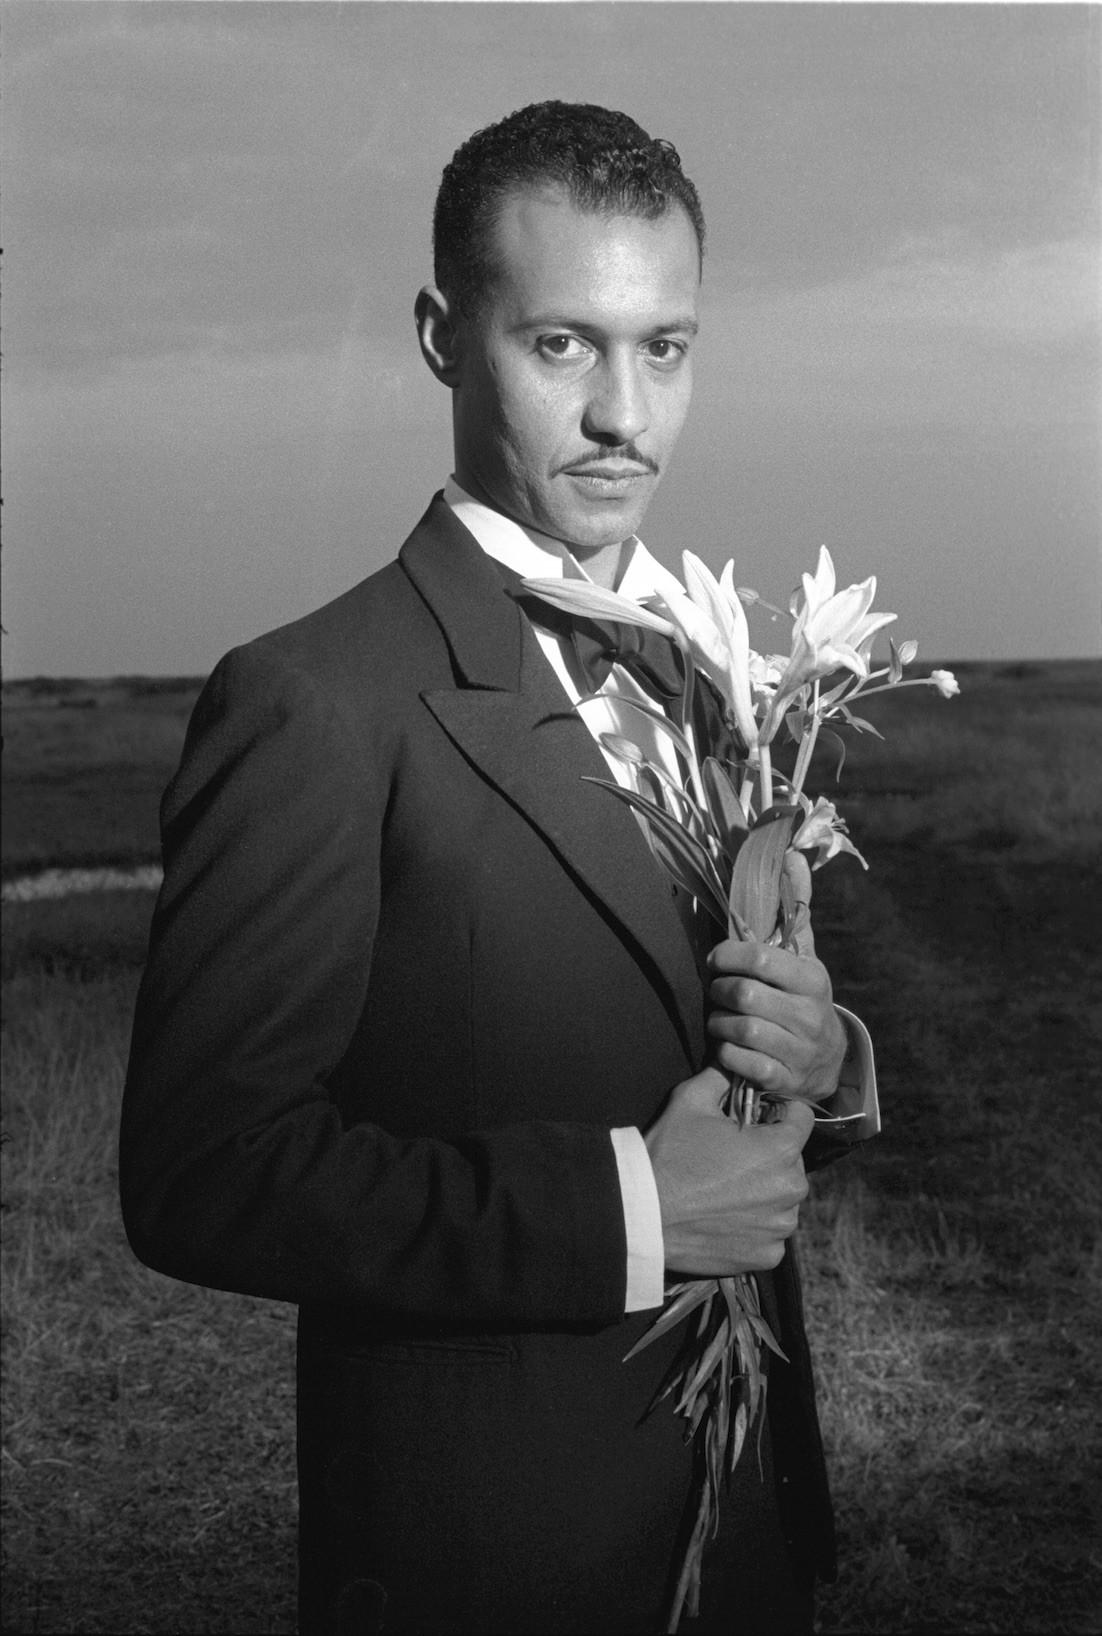 Isaac Julien, Looking for Langston (Looking for Langston Vintage Series), 1989/2016